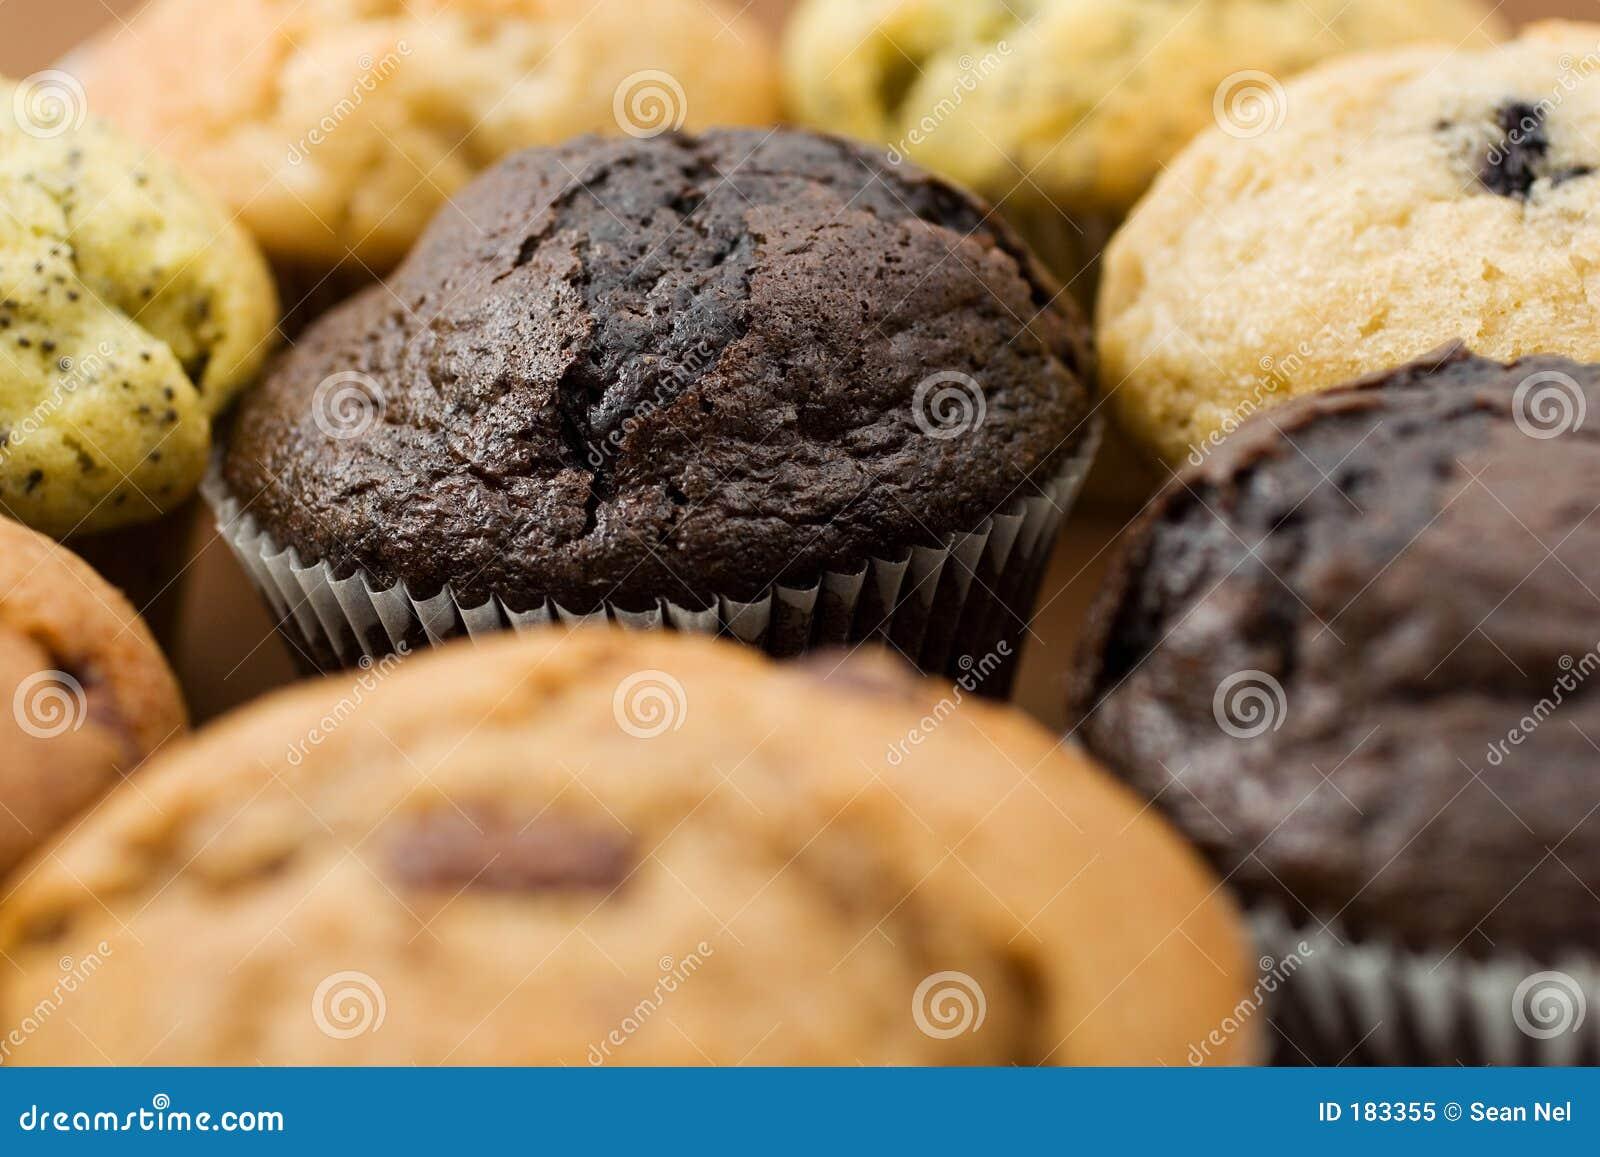 Download 11食物 库存图片. 图片 包括有 食物, 焦糖, 松饼, 罂粟的种子, bacterias, 划线员, 酥皮点心 - 183355